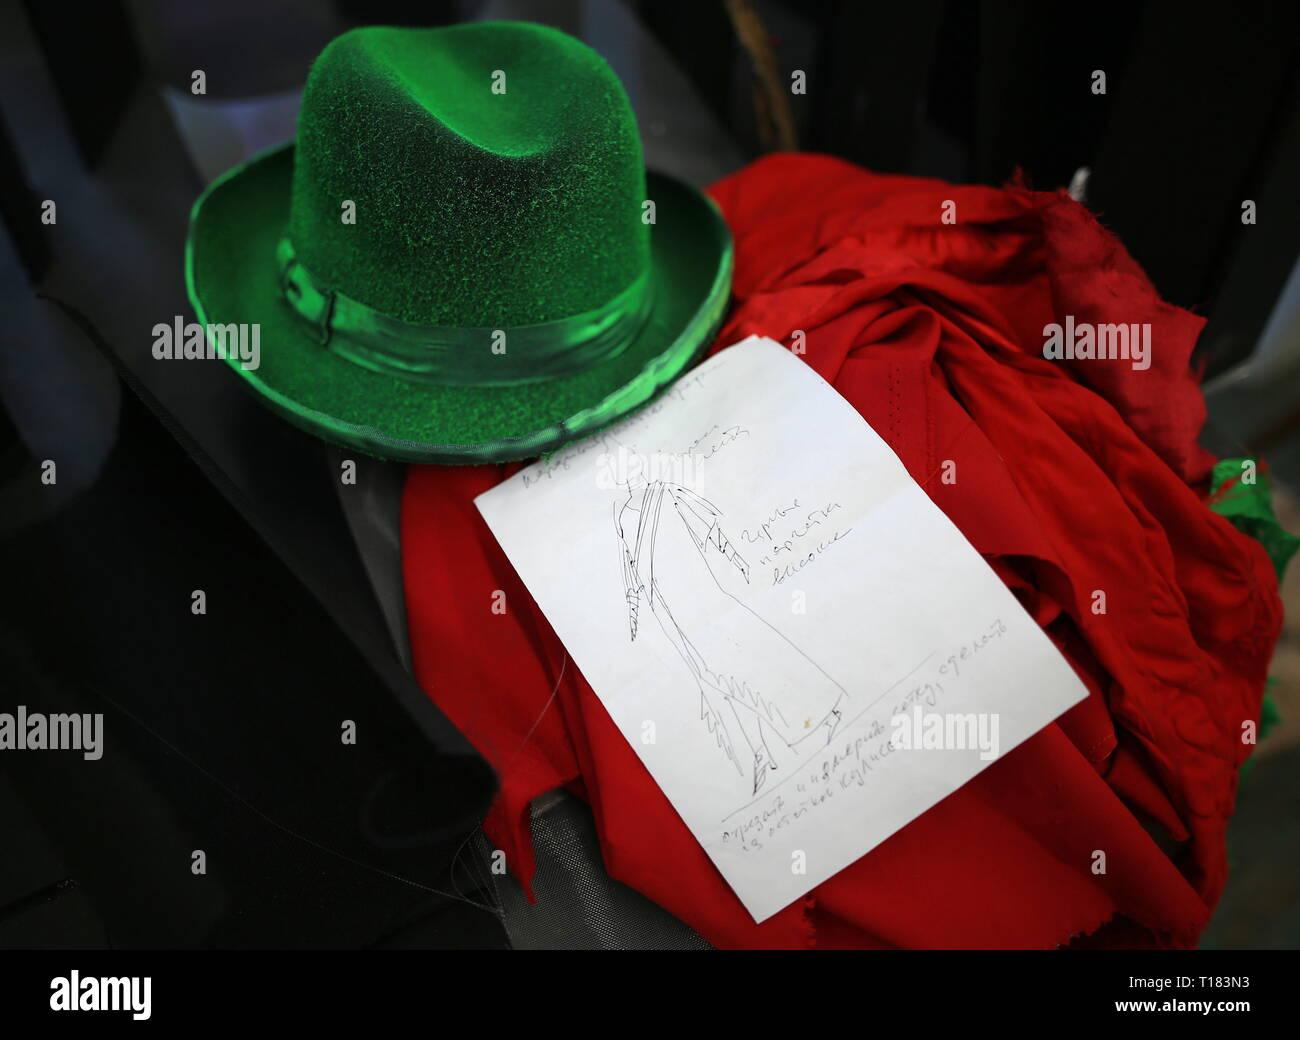 Kostümskizze Stockfotos und  bilder Kaufen   Alamy